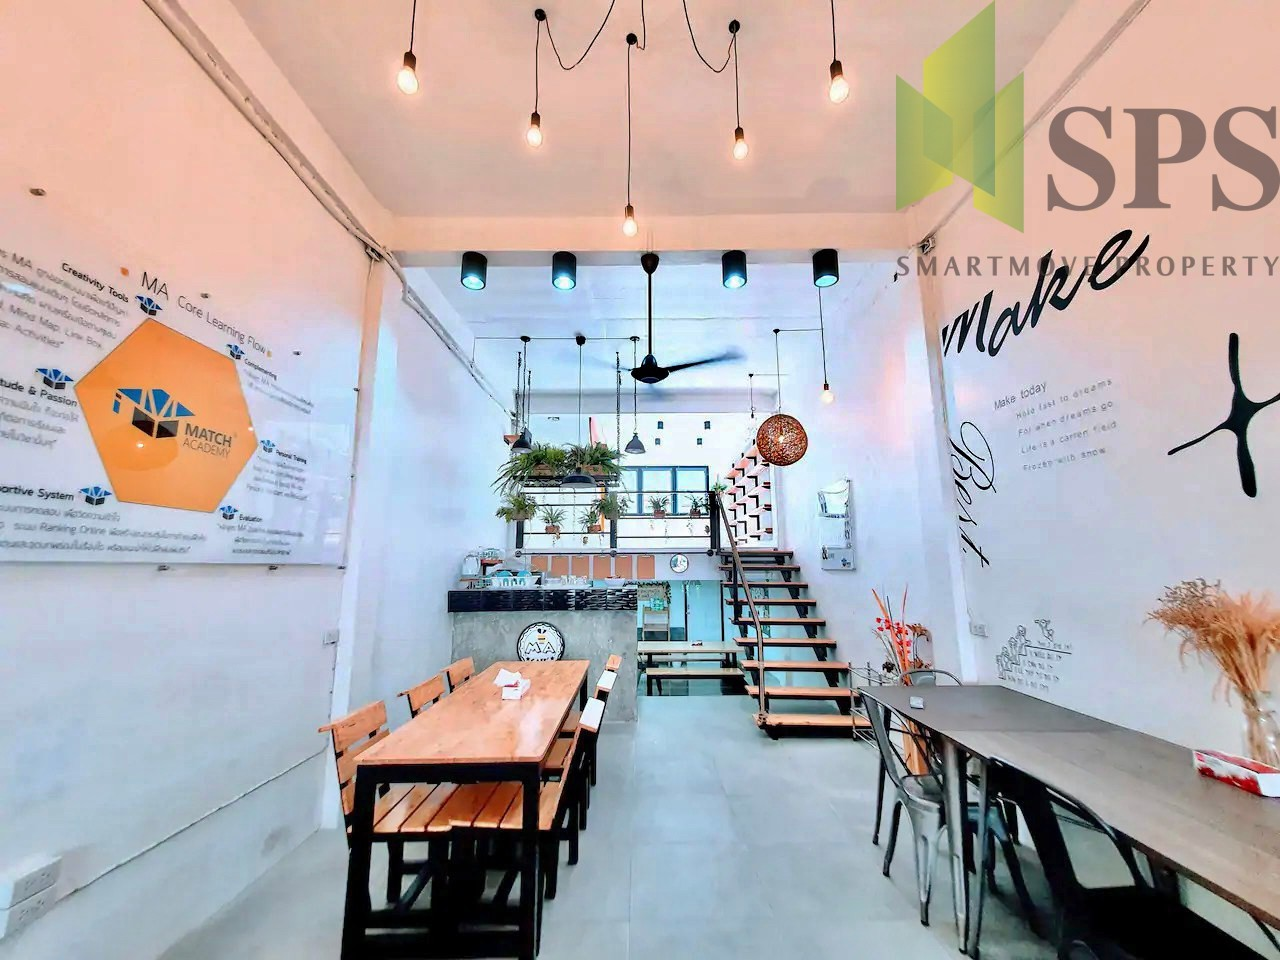 Commercial Building for SALE at SUKHUMVIT/ ขายอาคารพาณิชย์ พร้อมตกแต่งใหม่ ใกล้สถานีรถไฟฟ้า (Property ID: SPS-PP307)